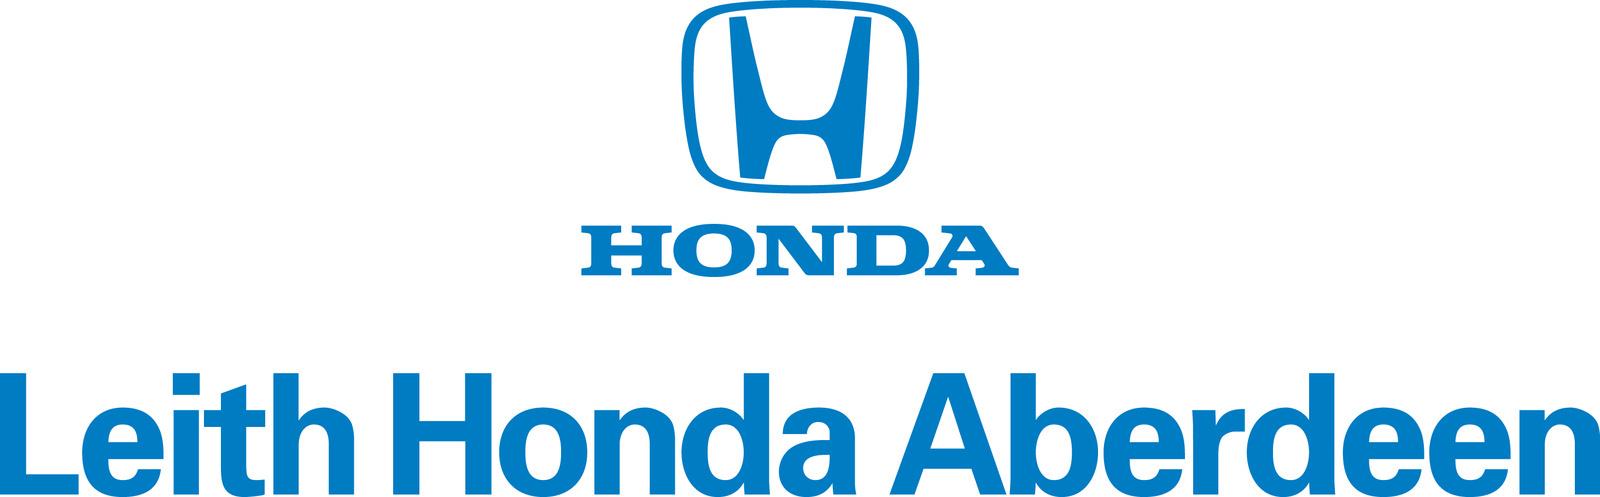 Leith honda aberdeen aberdeen nc read consumer reviews for Leith honda service